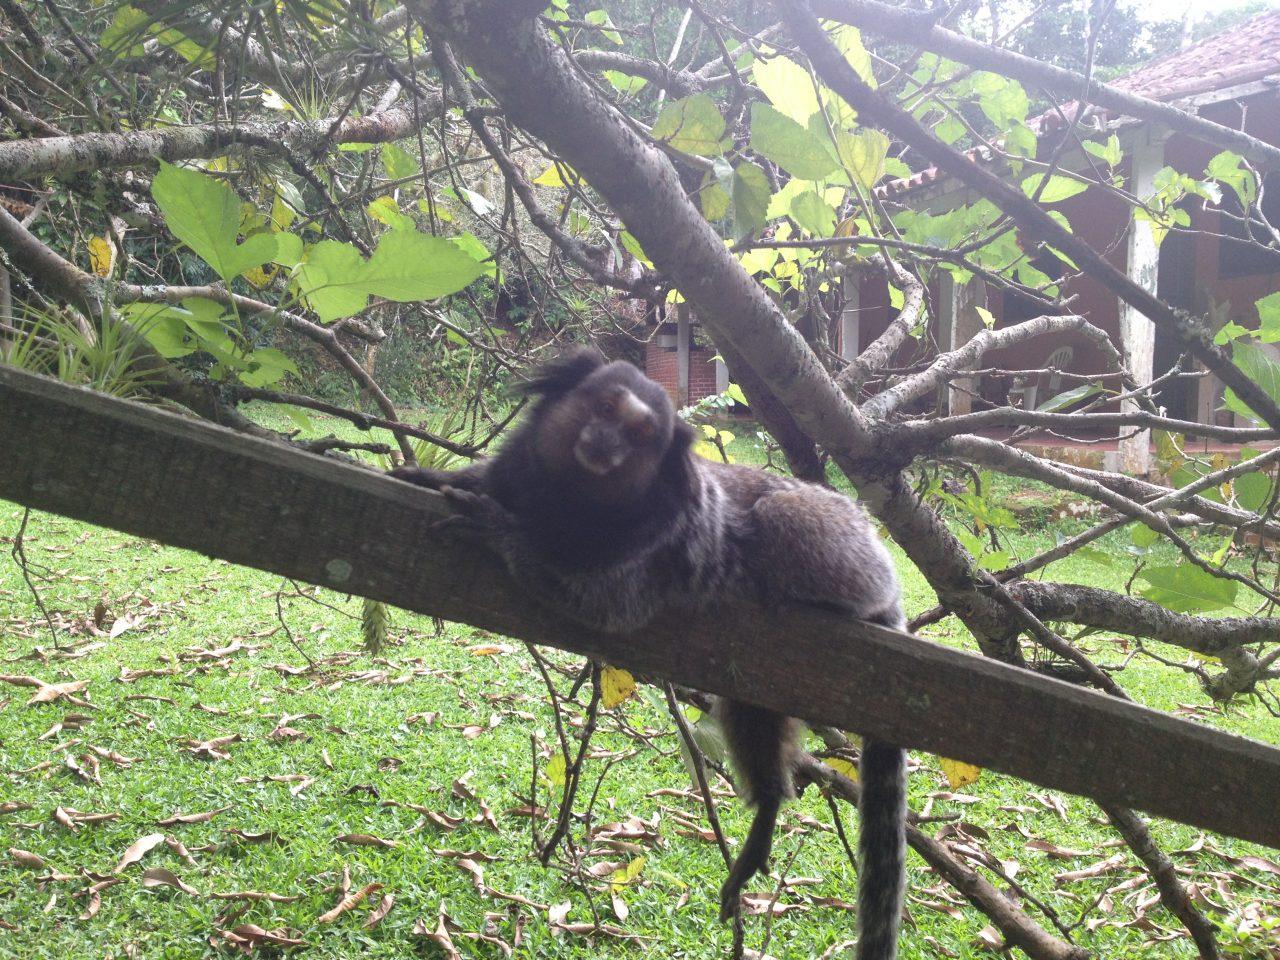 Ilha Anchieta - Macacos